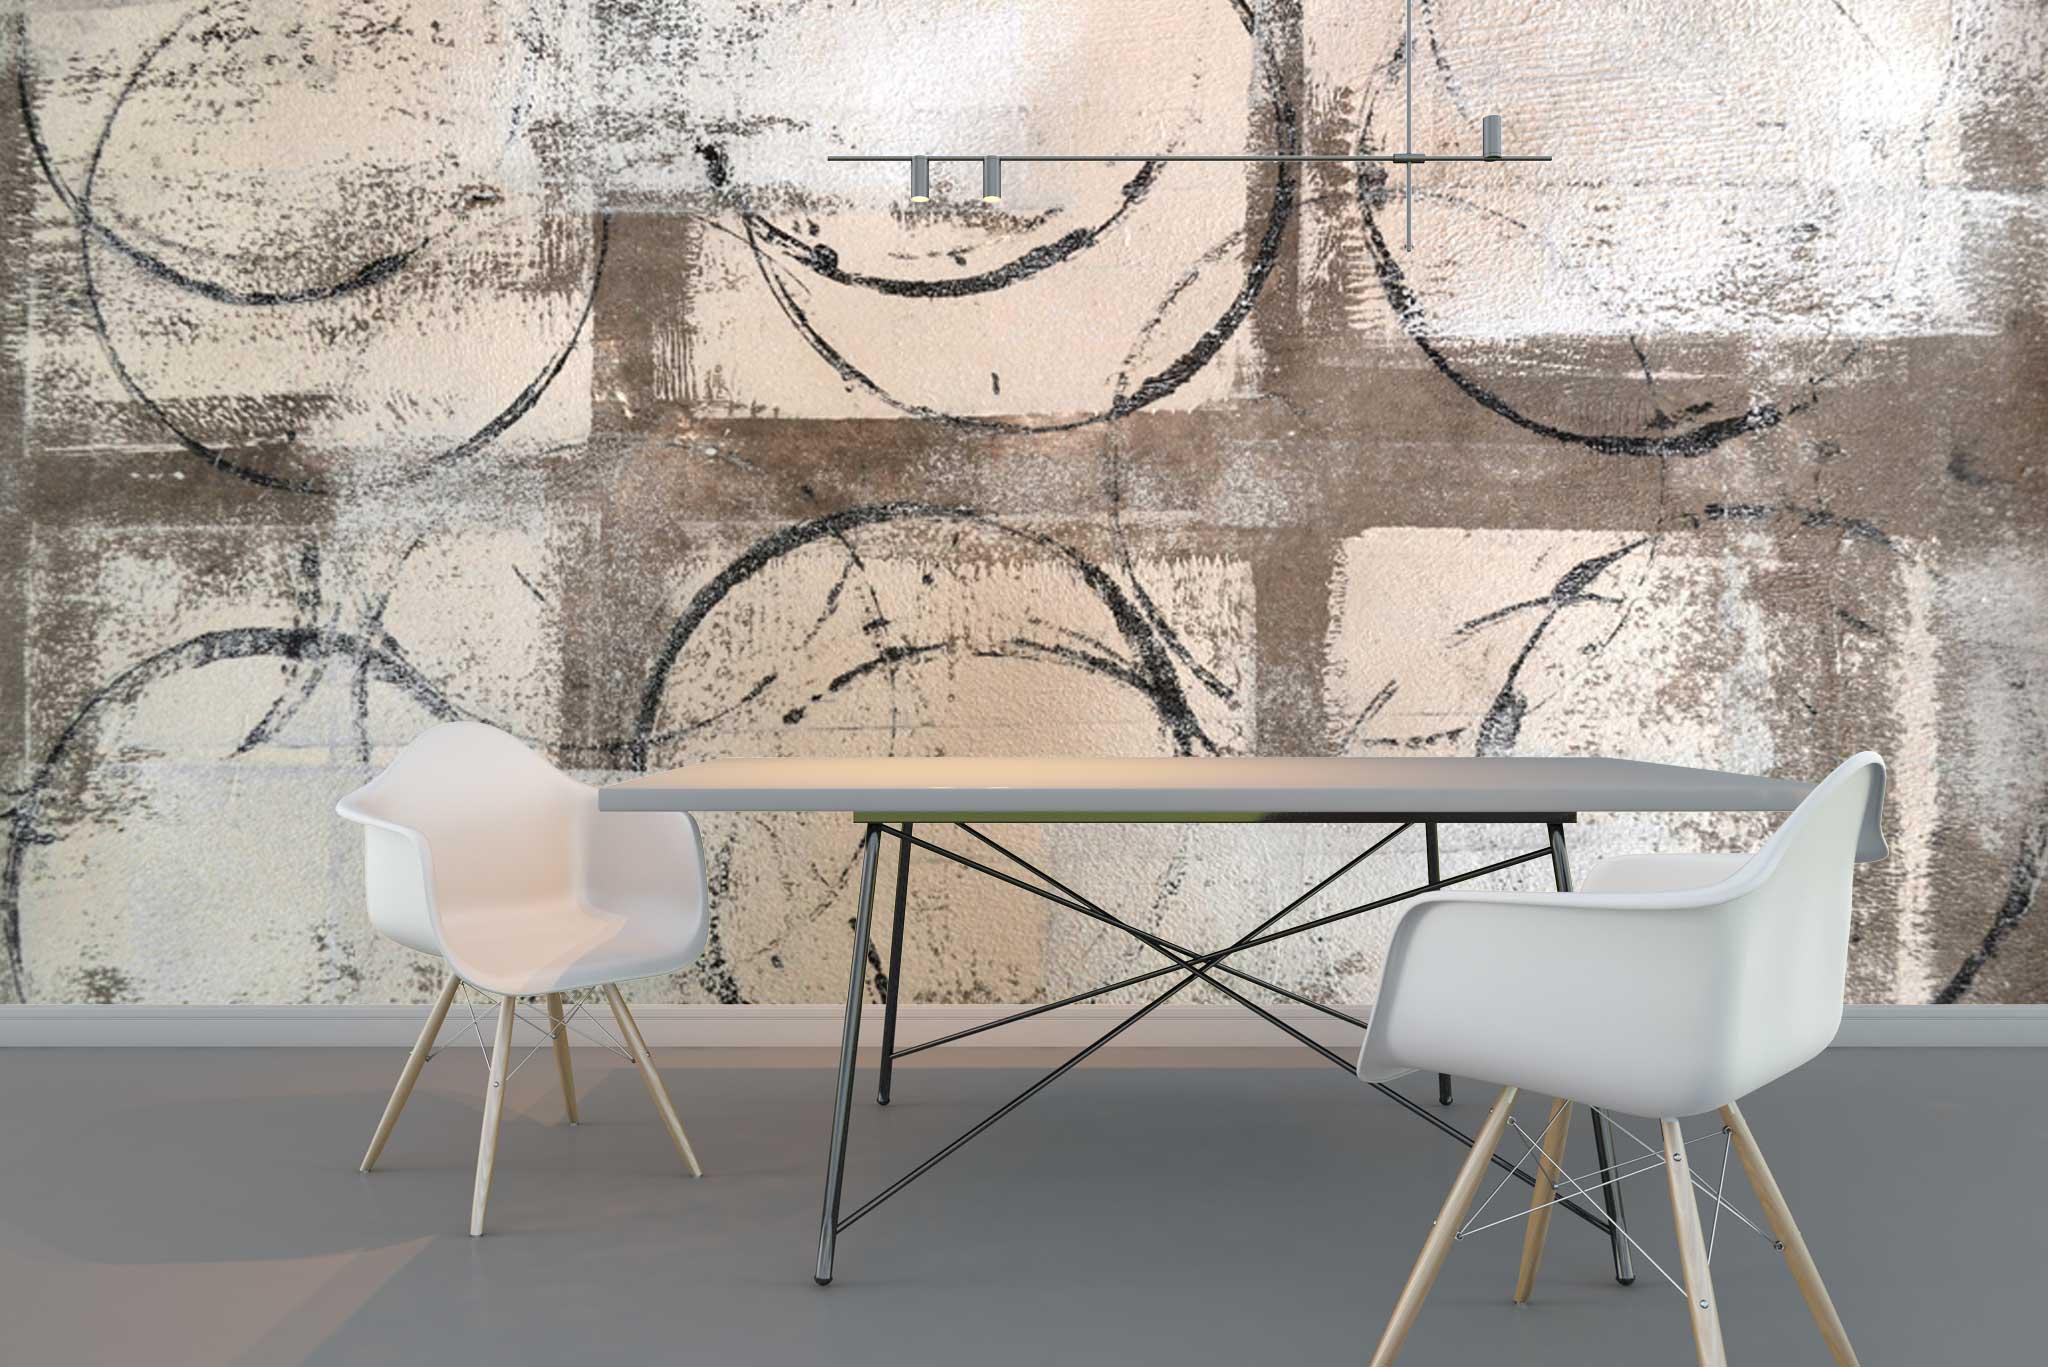 tapet-fototapet-comanda-personalizat-bucuresti-perete-special-lux-model-pictura-desen-abstract-cercuri-argintiu